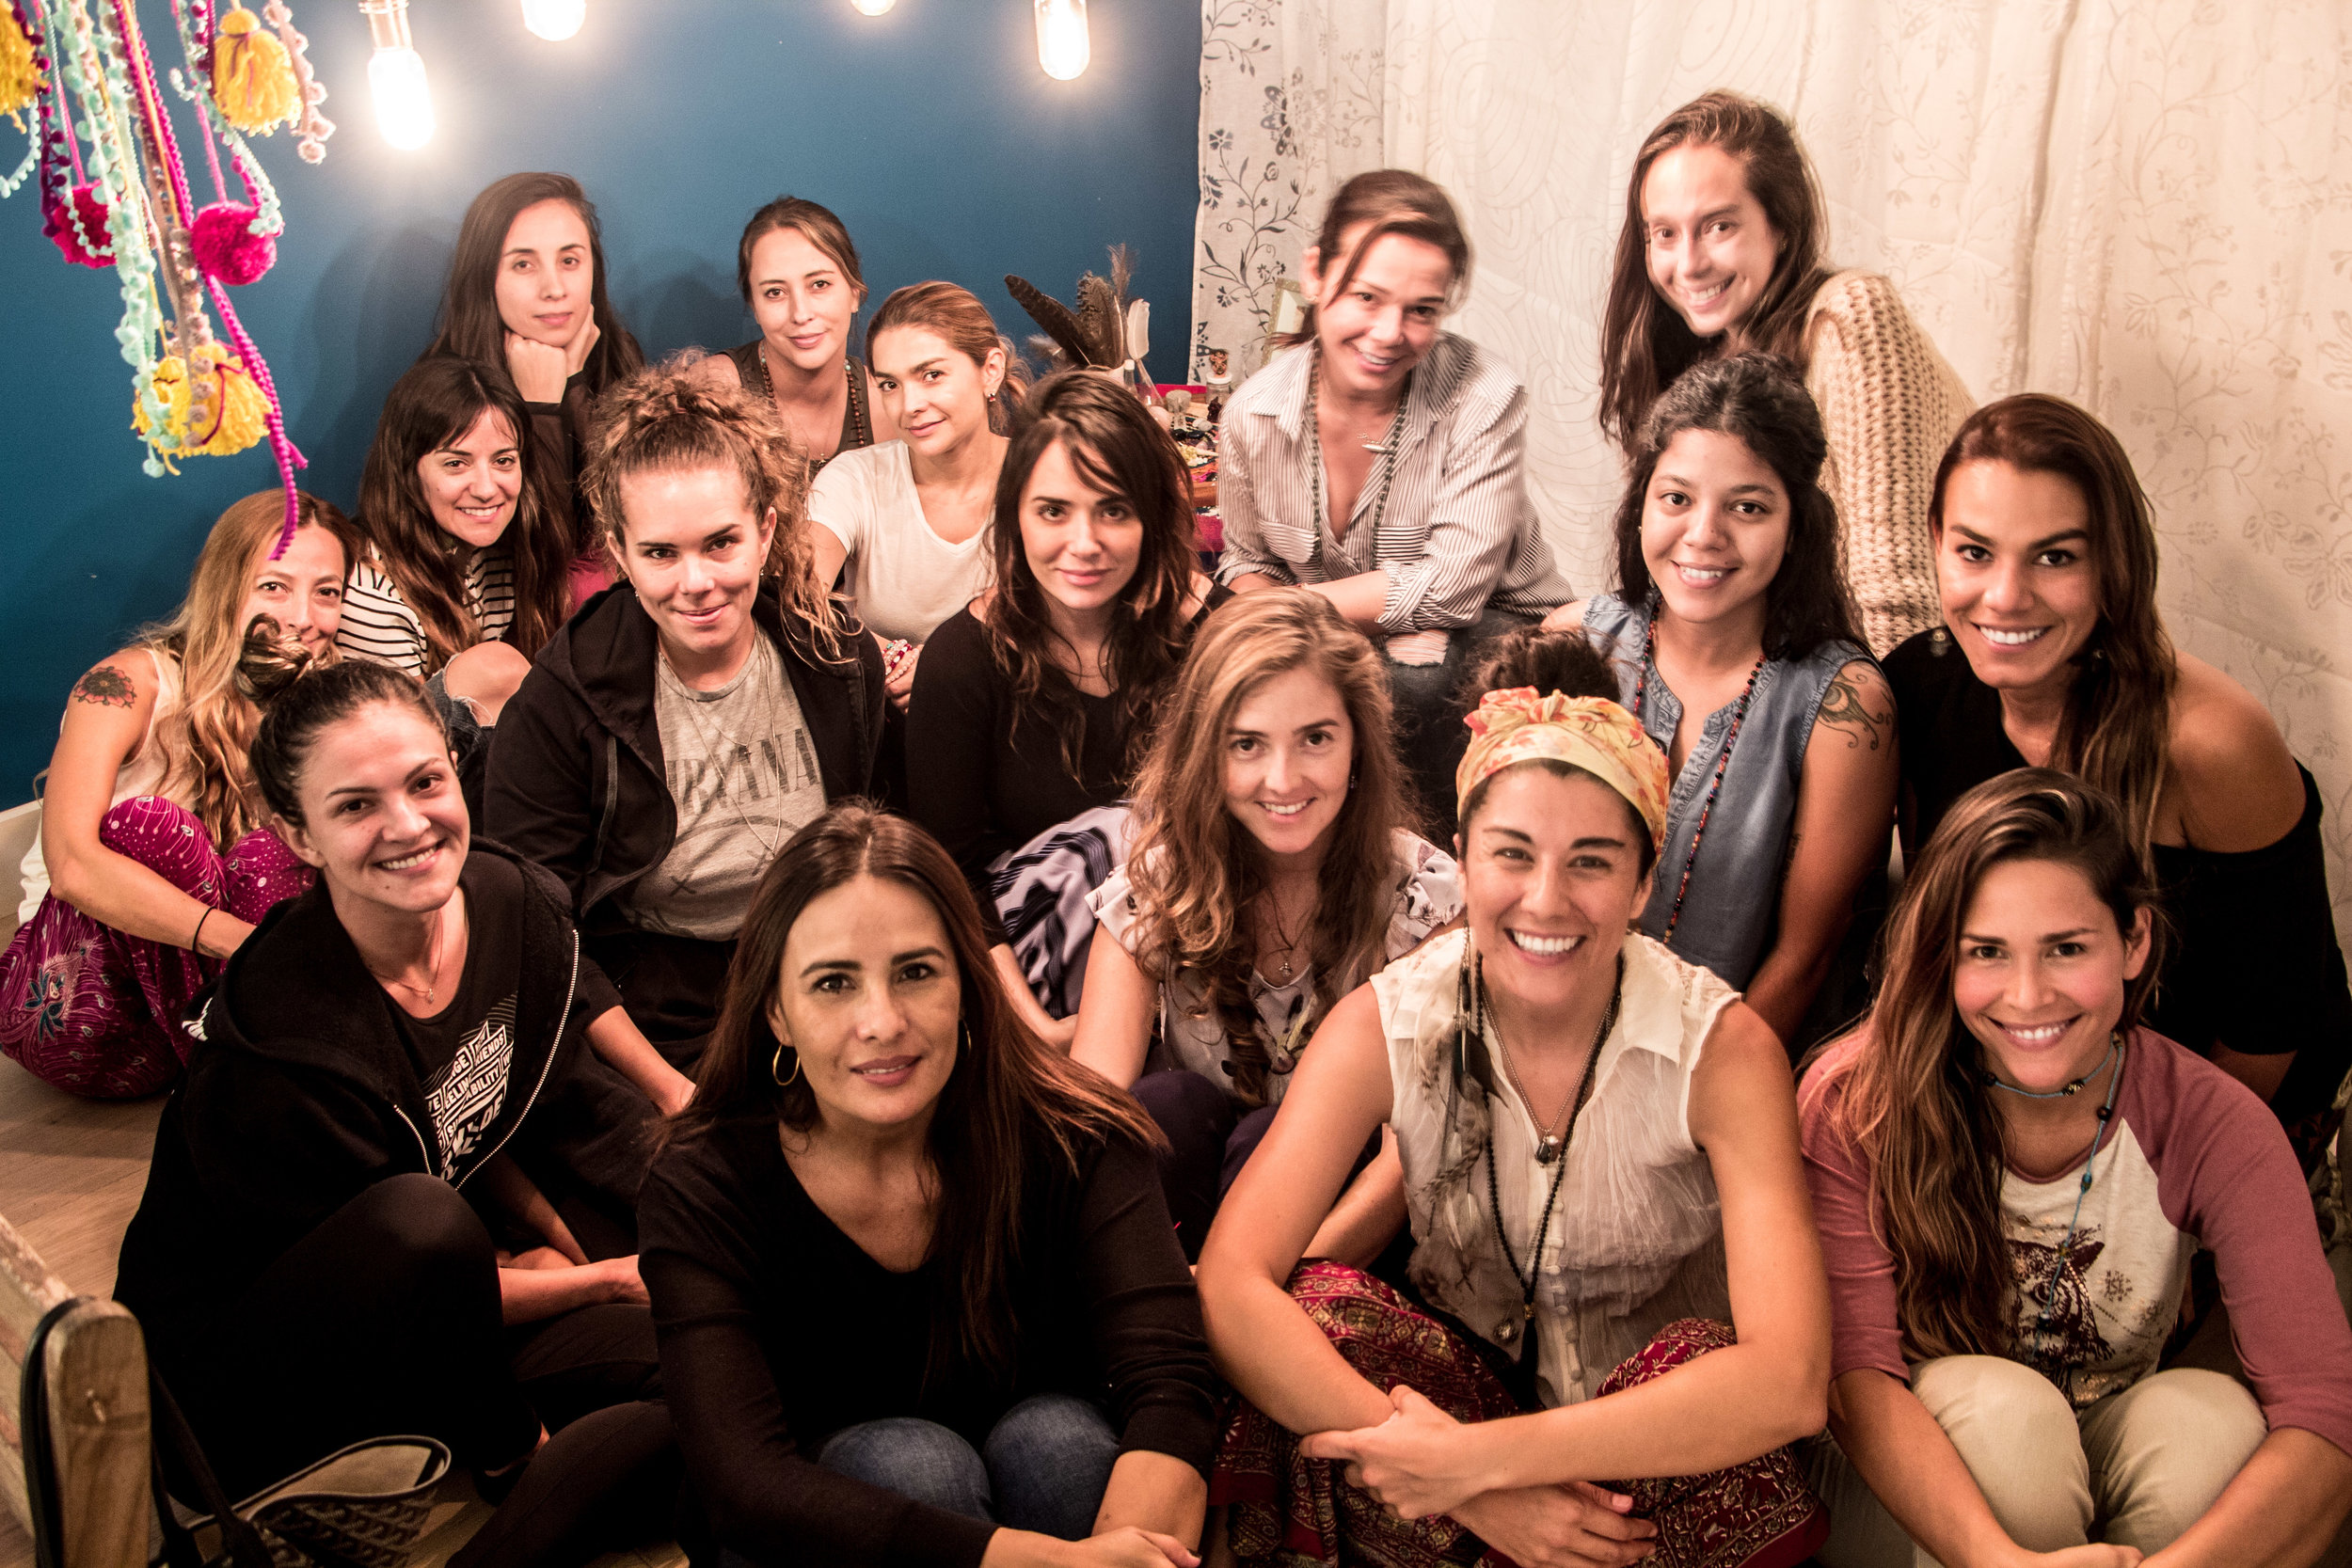 Intuitive writers de derecha a izquierda, abajo hacia arriba. Joemy, AlasdeOrquidea, Vicky, María, Lousiana, Juli, Diana, Caro, Caro, Dani,Ángela, Sara, Margarita, Narda, Susi, Gina.